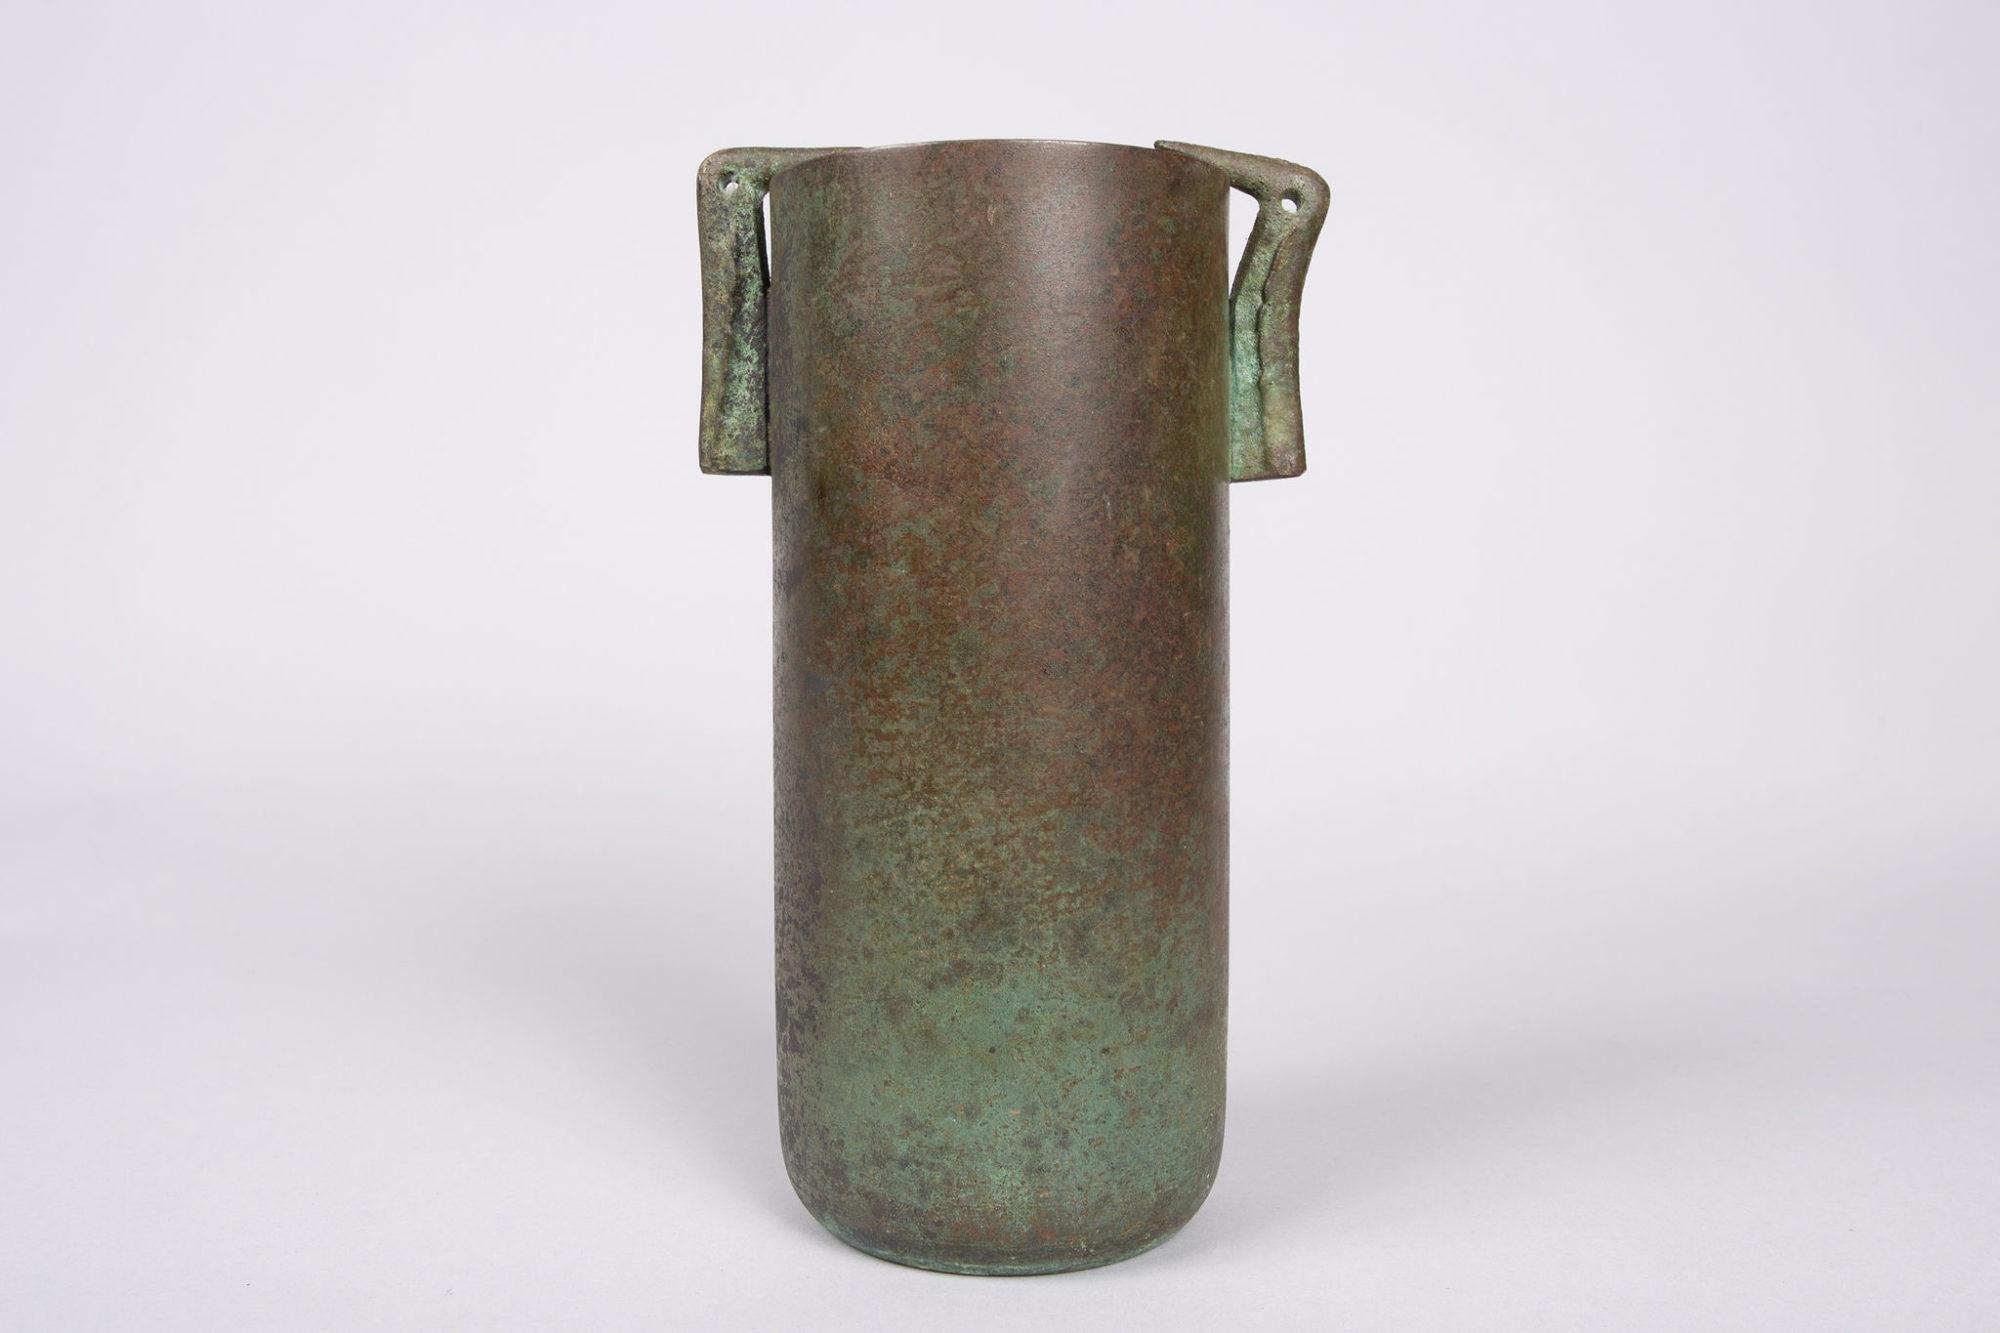 Japanese Bronze Vase with Bird Handles